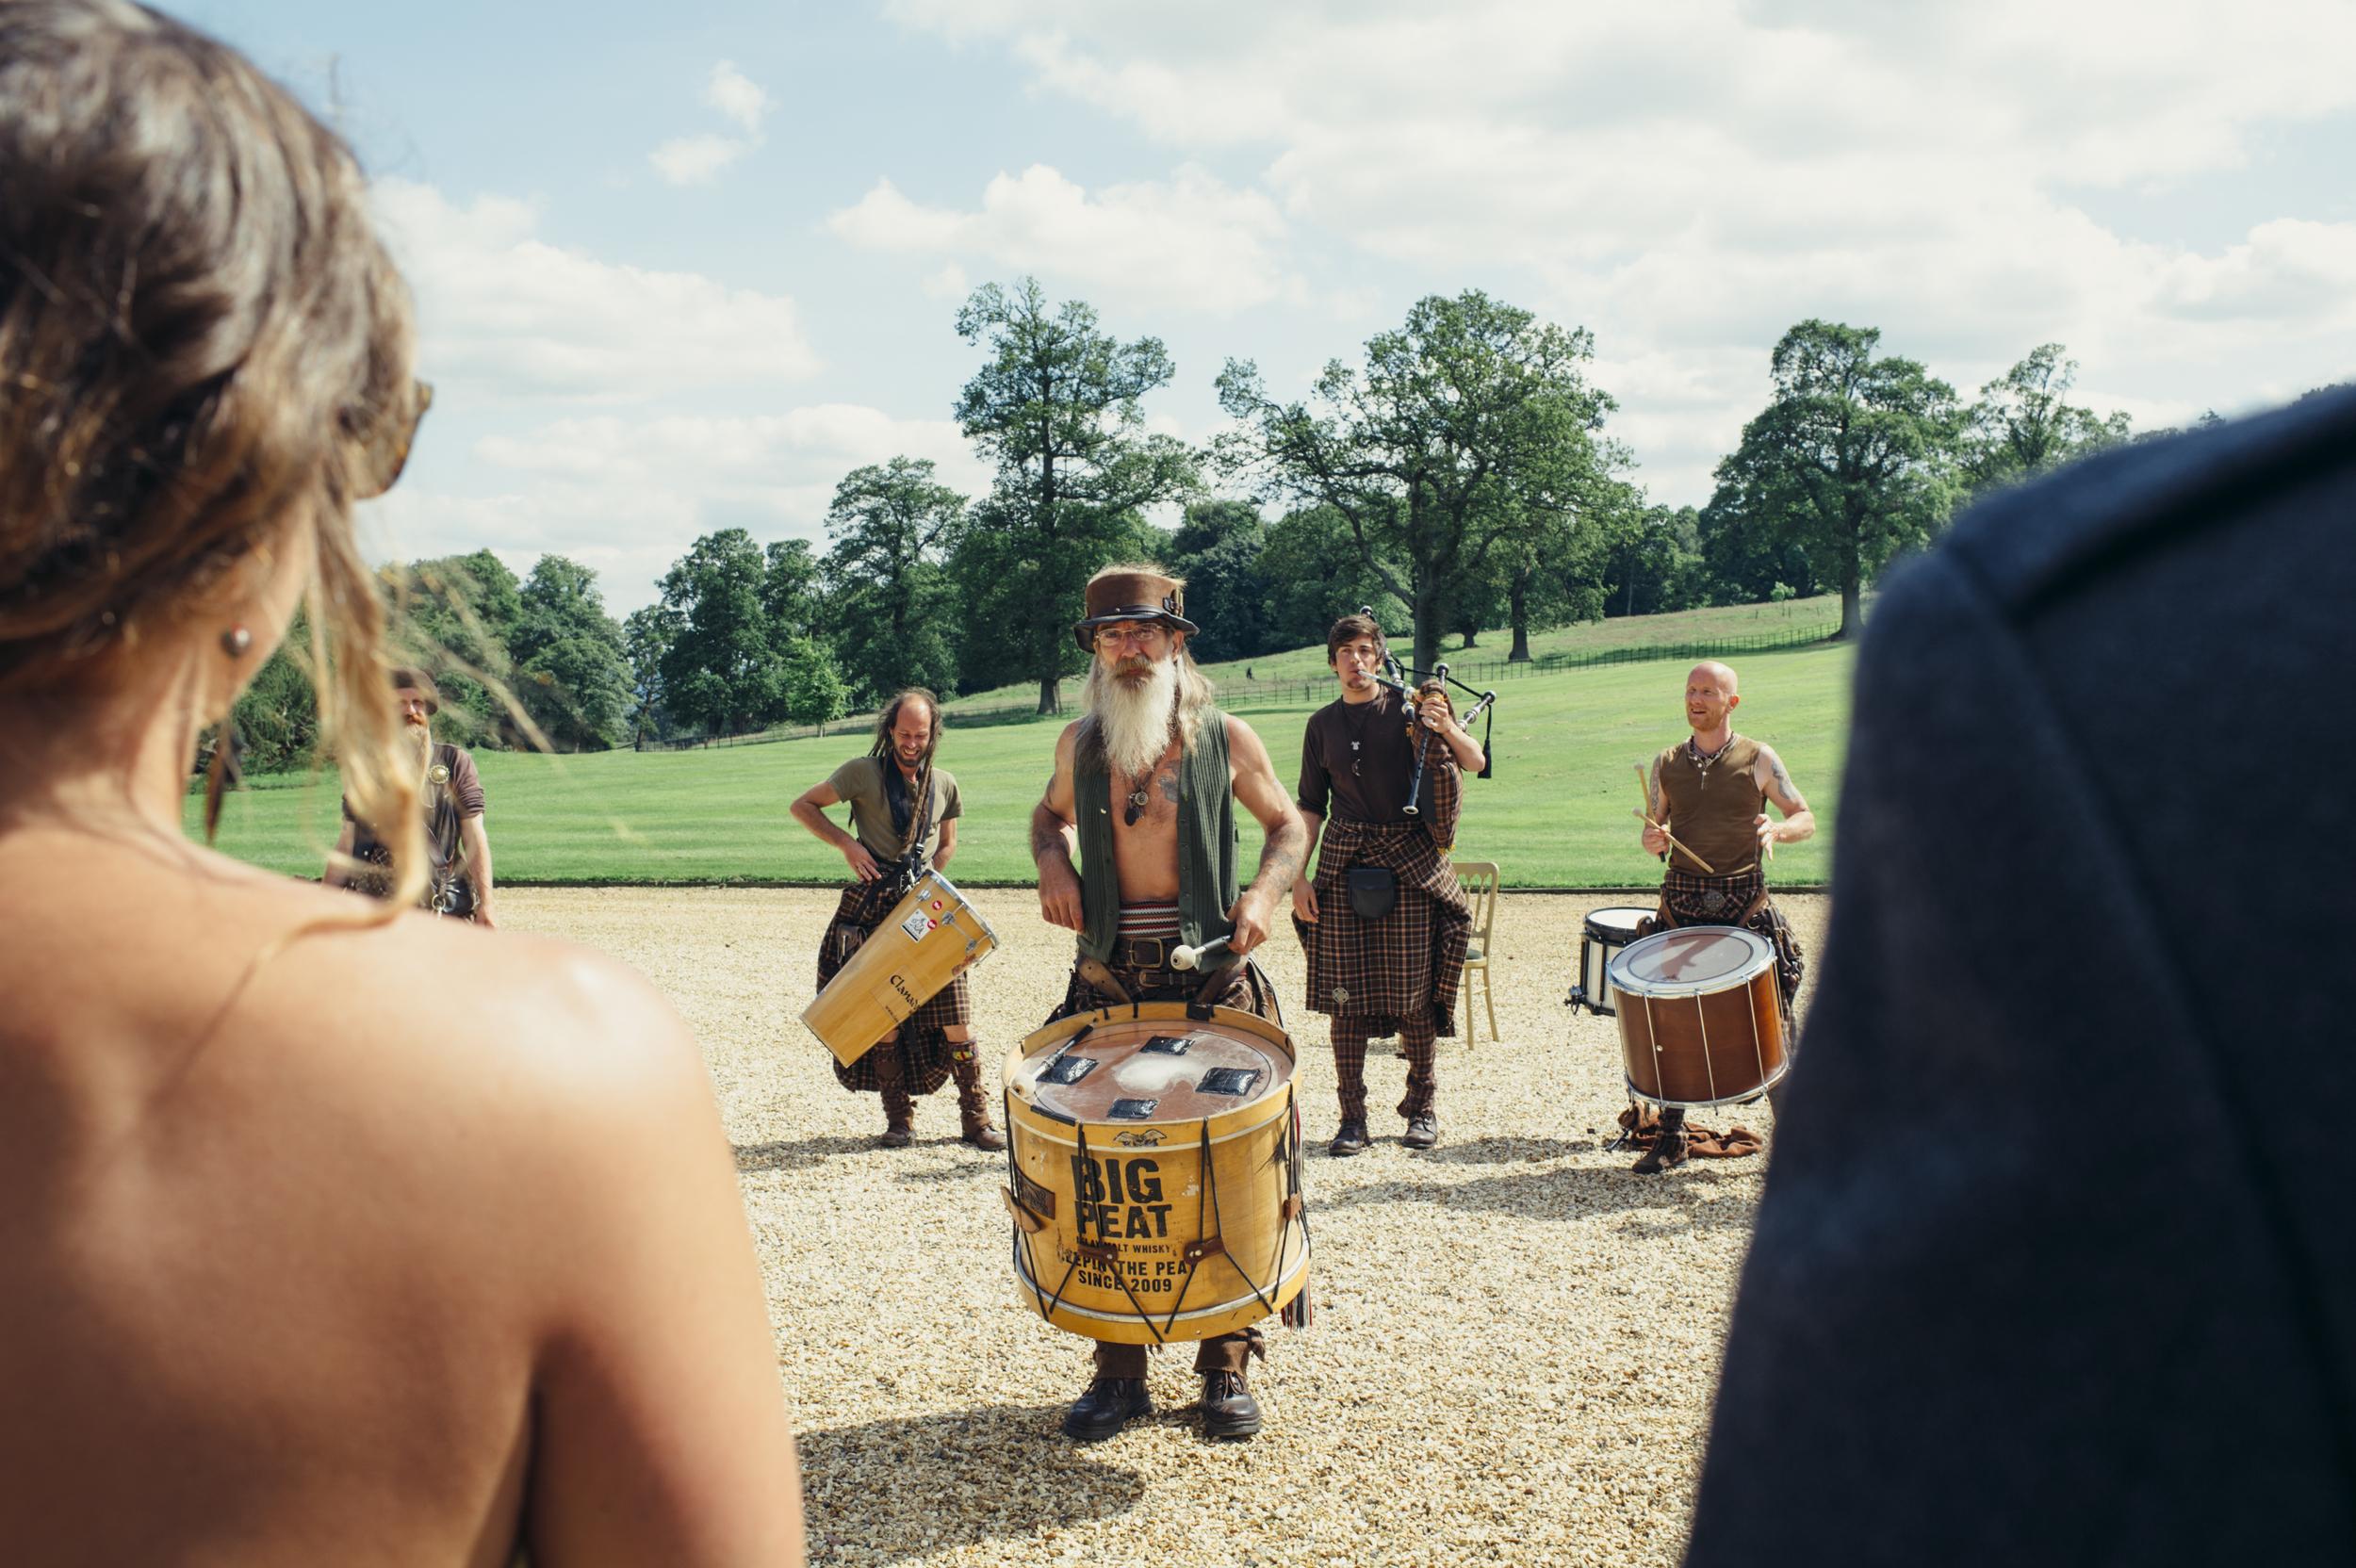 0131-lisa-devine-alternative-creative-wedding-photography-glasgow-edinburgh.JPG